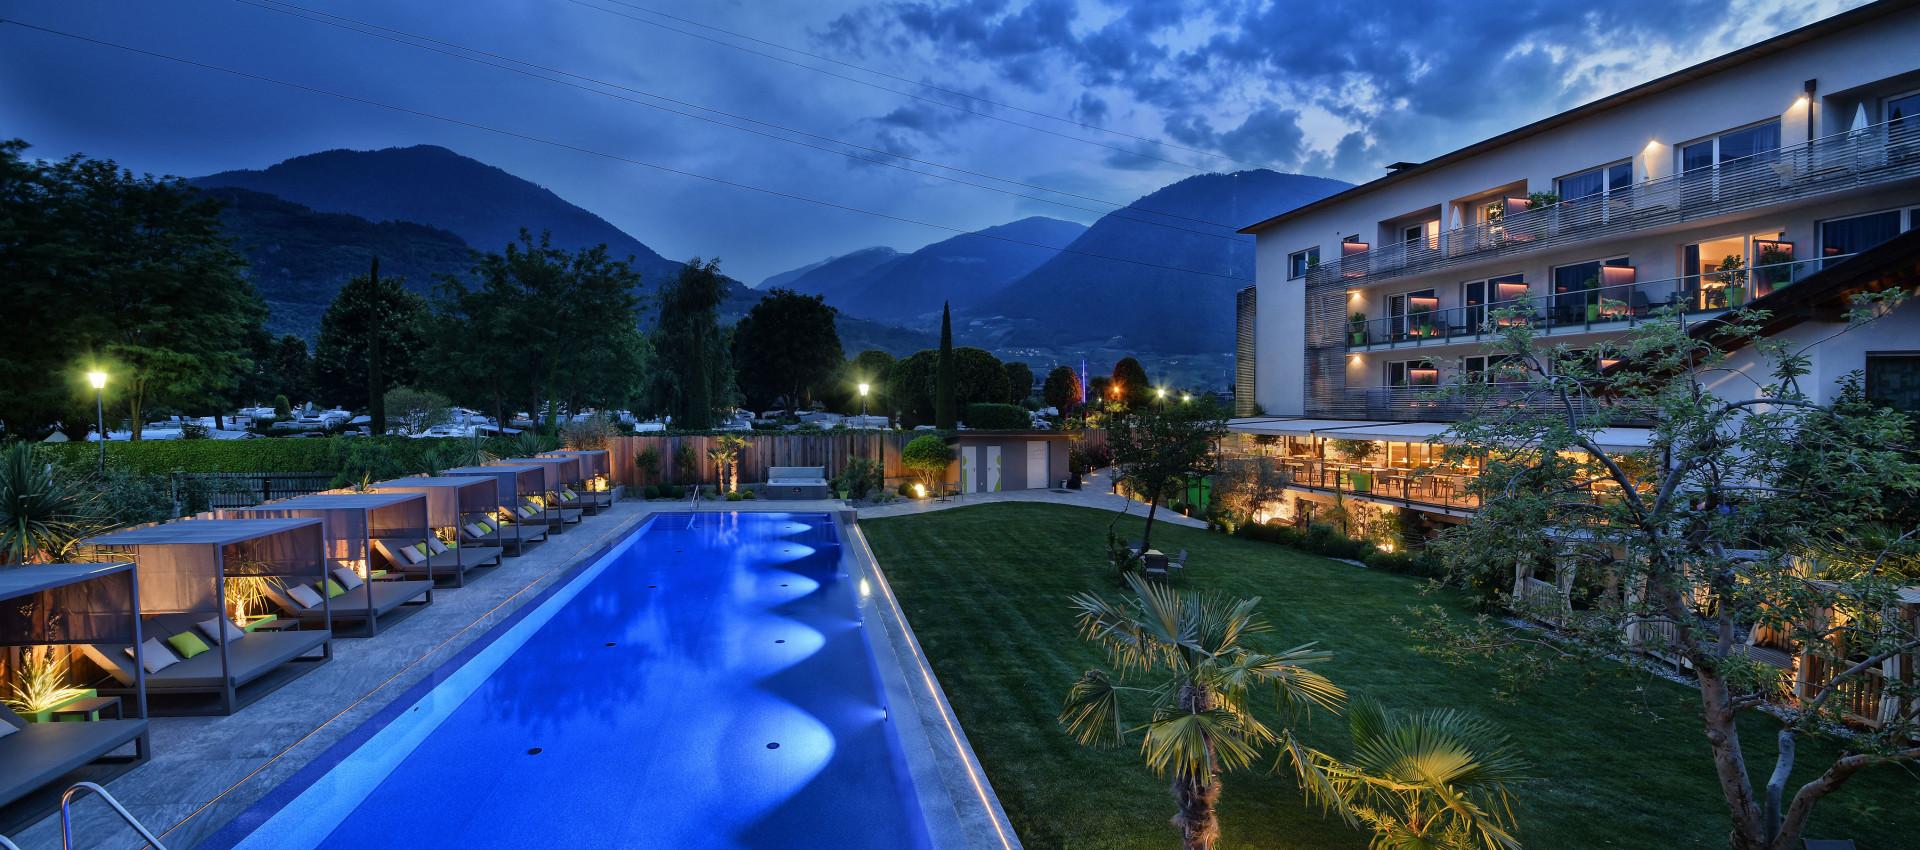 Hotel Pfeiss in Lana, Genuss, Erholung